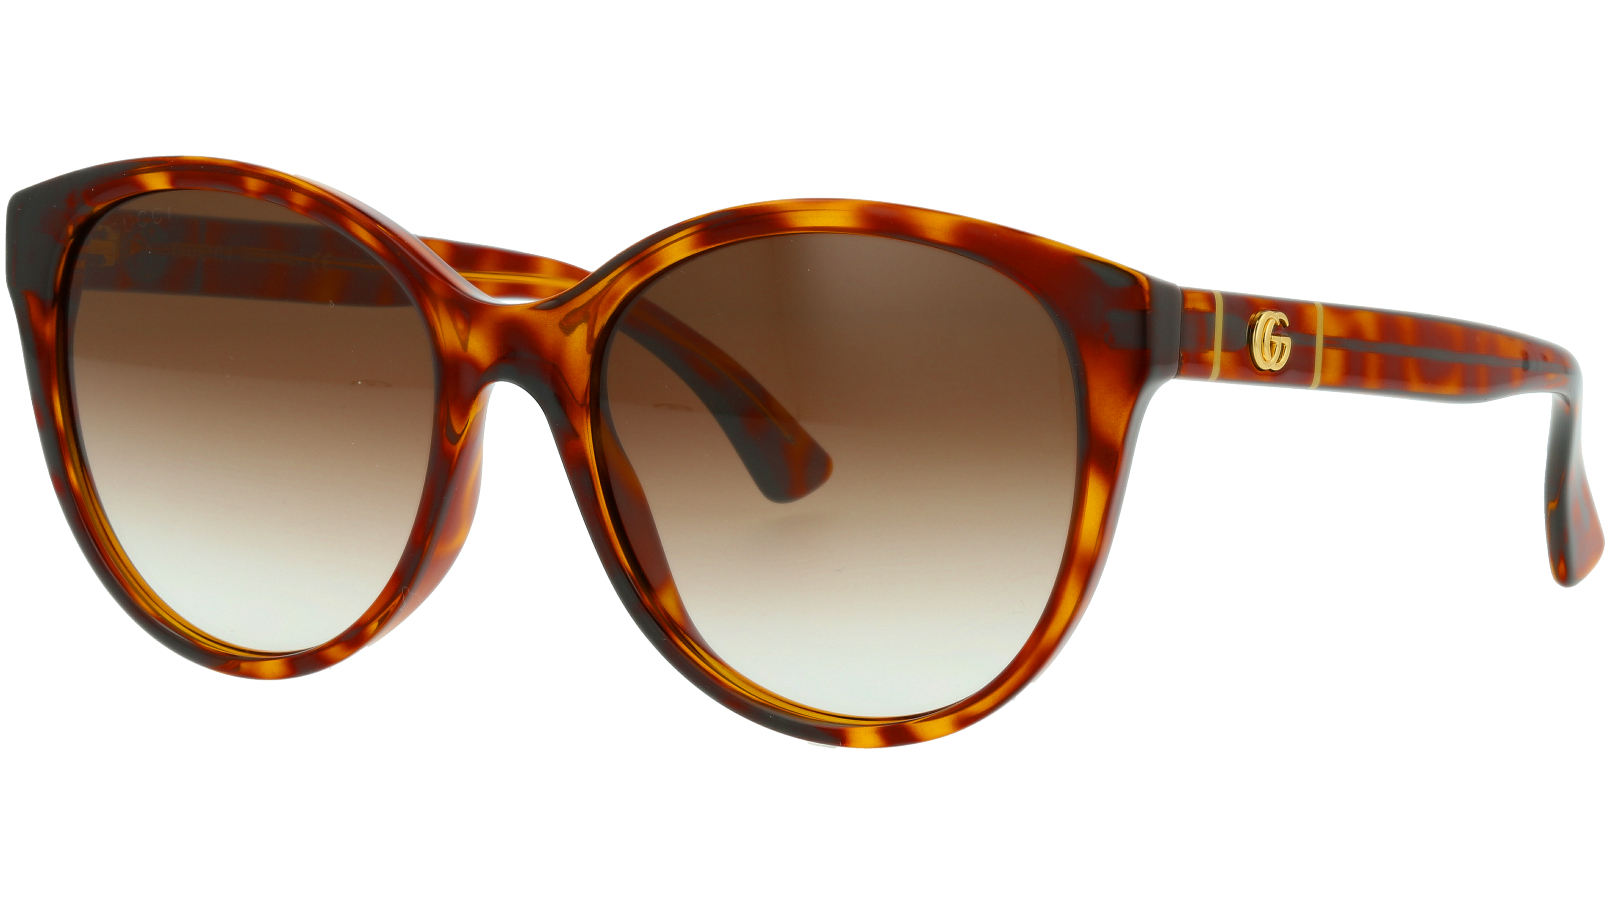 Gucci GG0631S 002 56 Havana Round Sunglasses